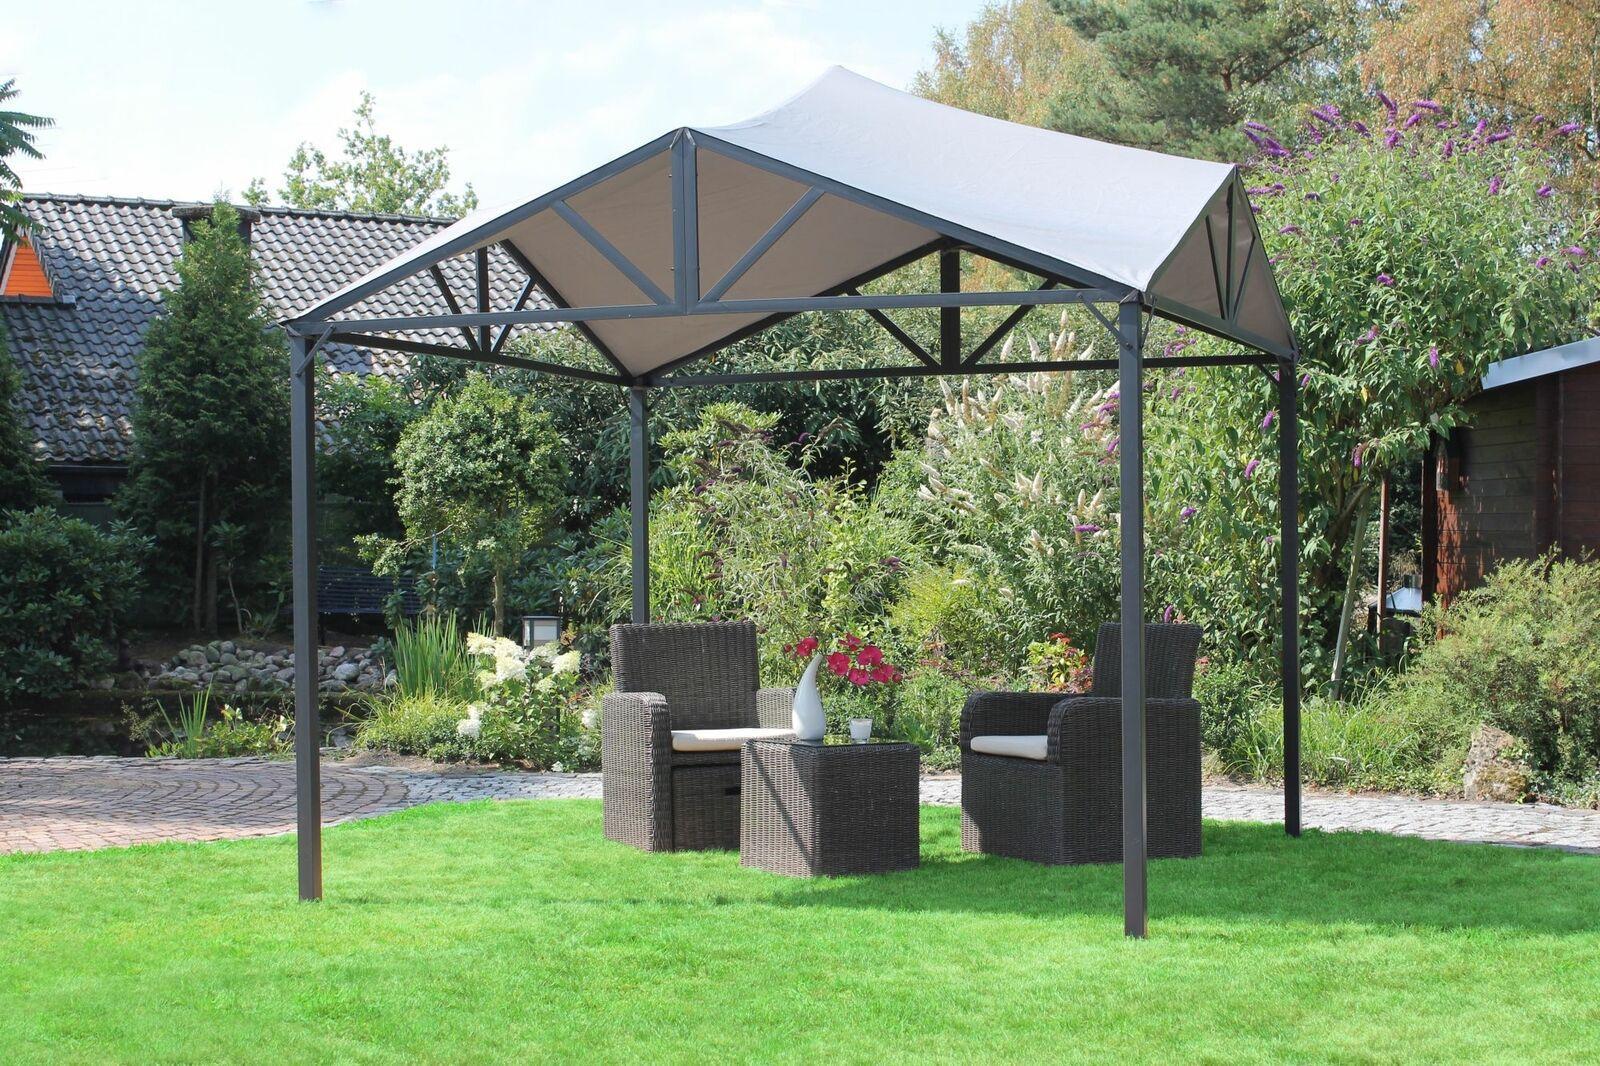 Sonnenschutz Pavillon Terrasse